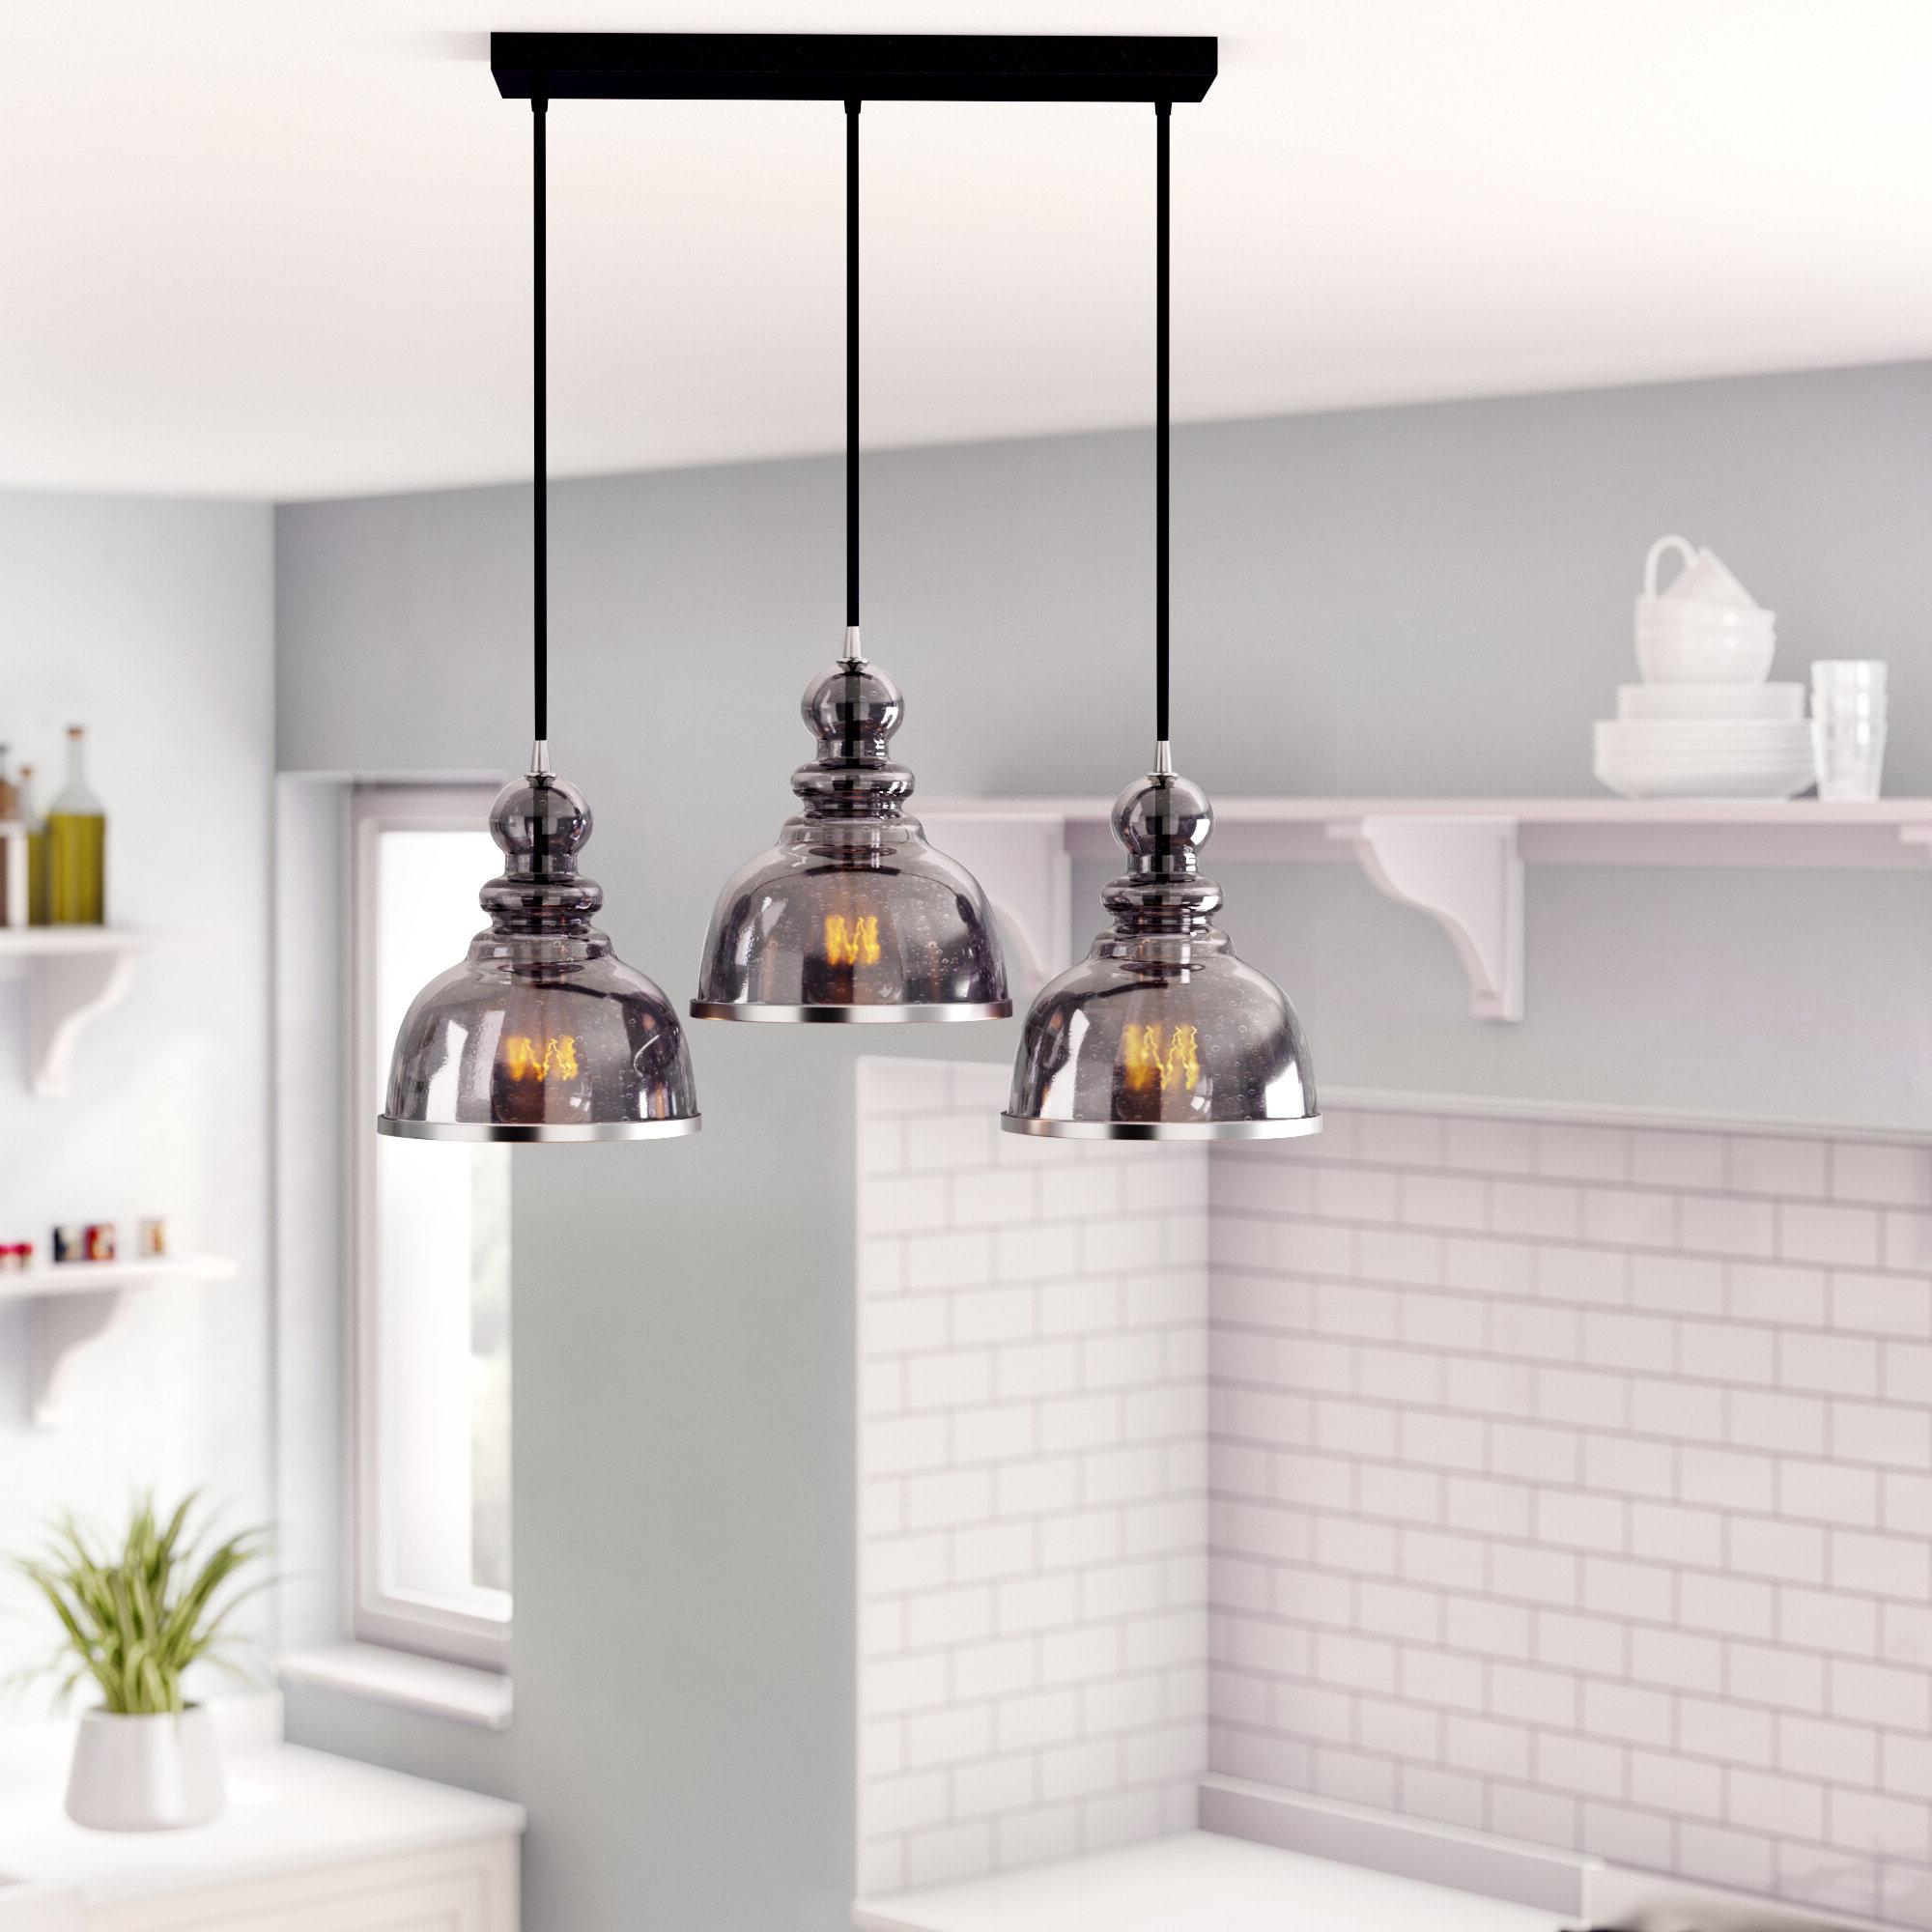 2019 Dunson 3 Light Kitchen Island Pendants Pertaining To Humphries 3light Kitchen Island Pendant Lighting Kitchen (View 6 of 20)